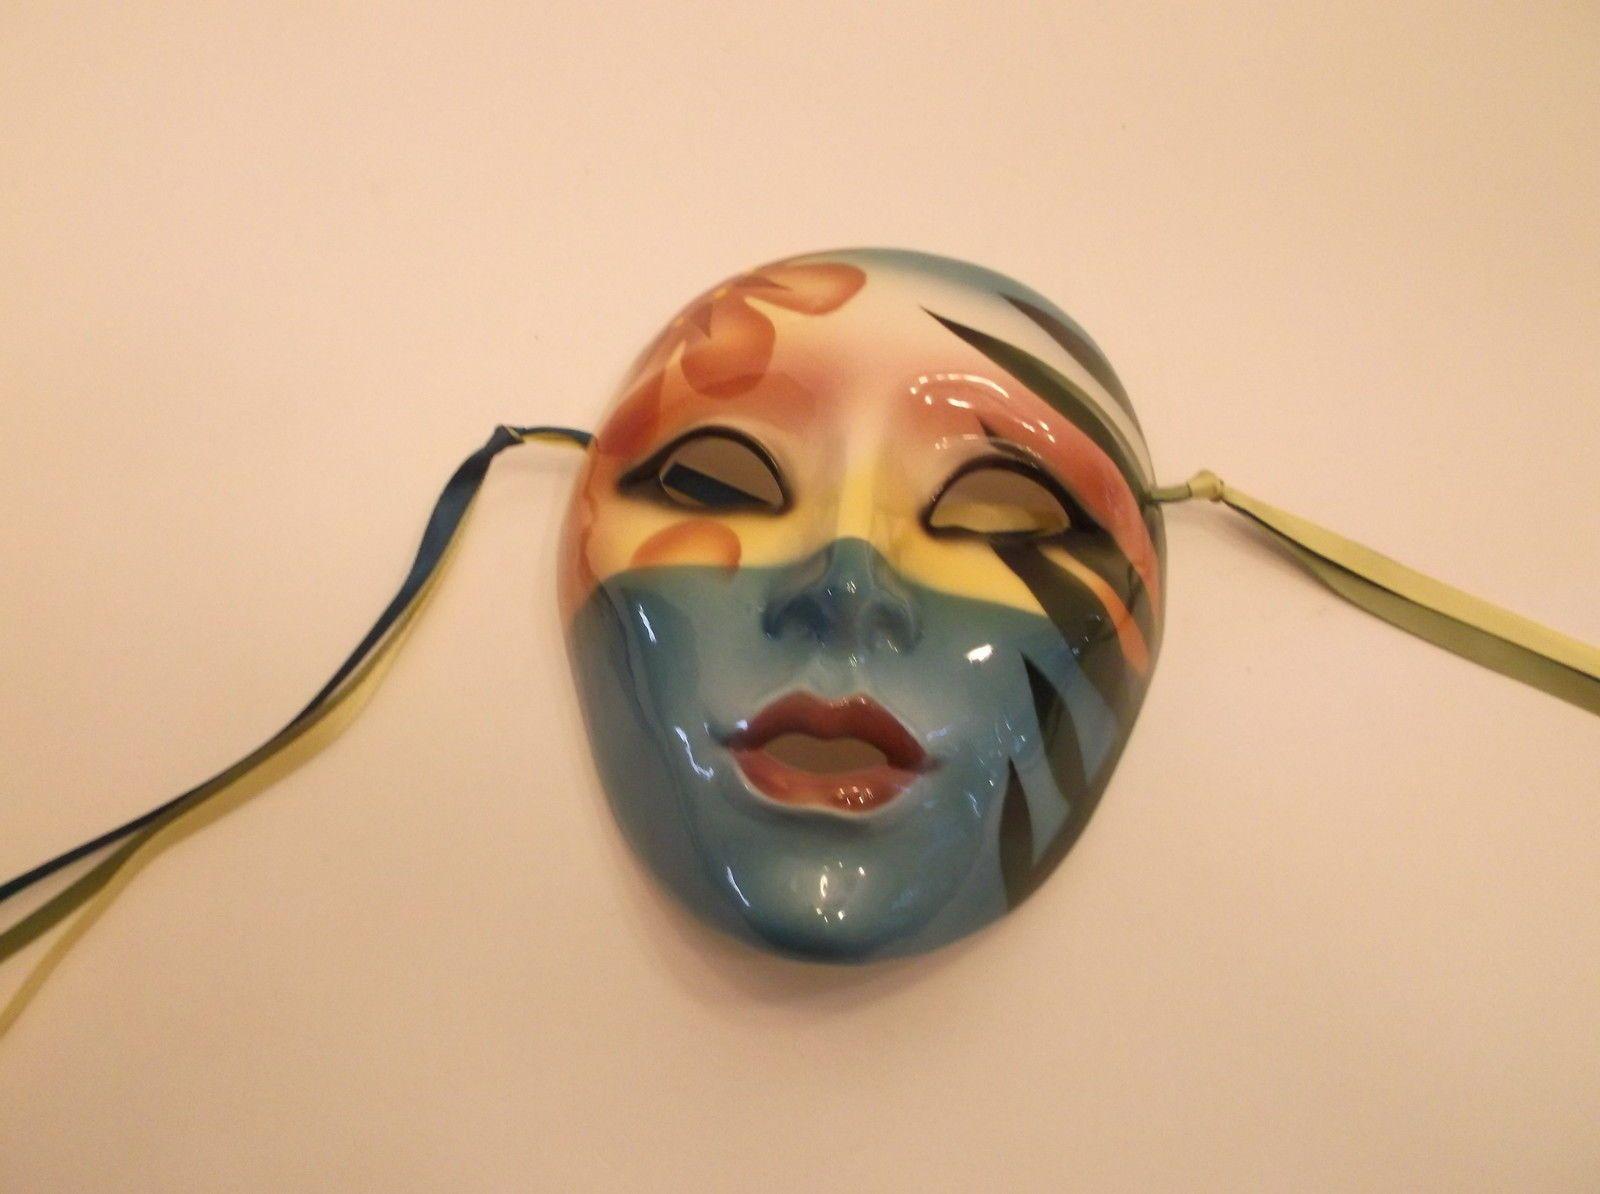 Clay art Mask San Francisco Co. Clay art, Masks